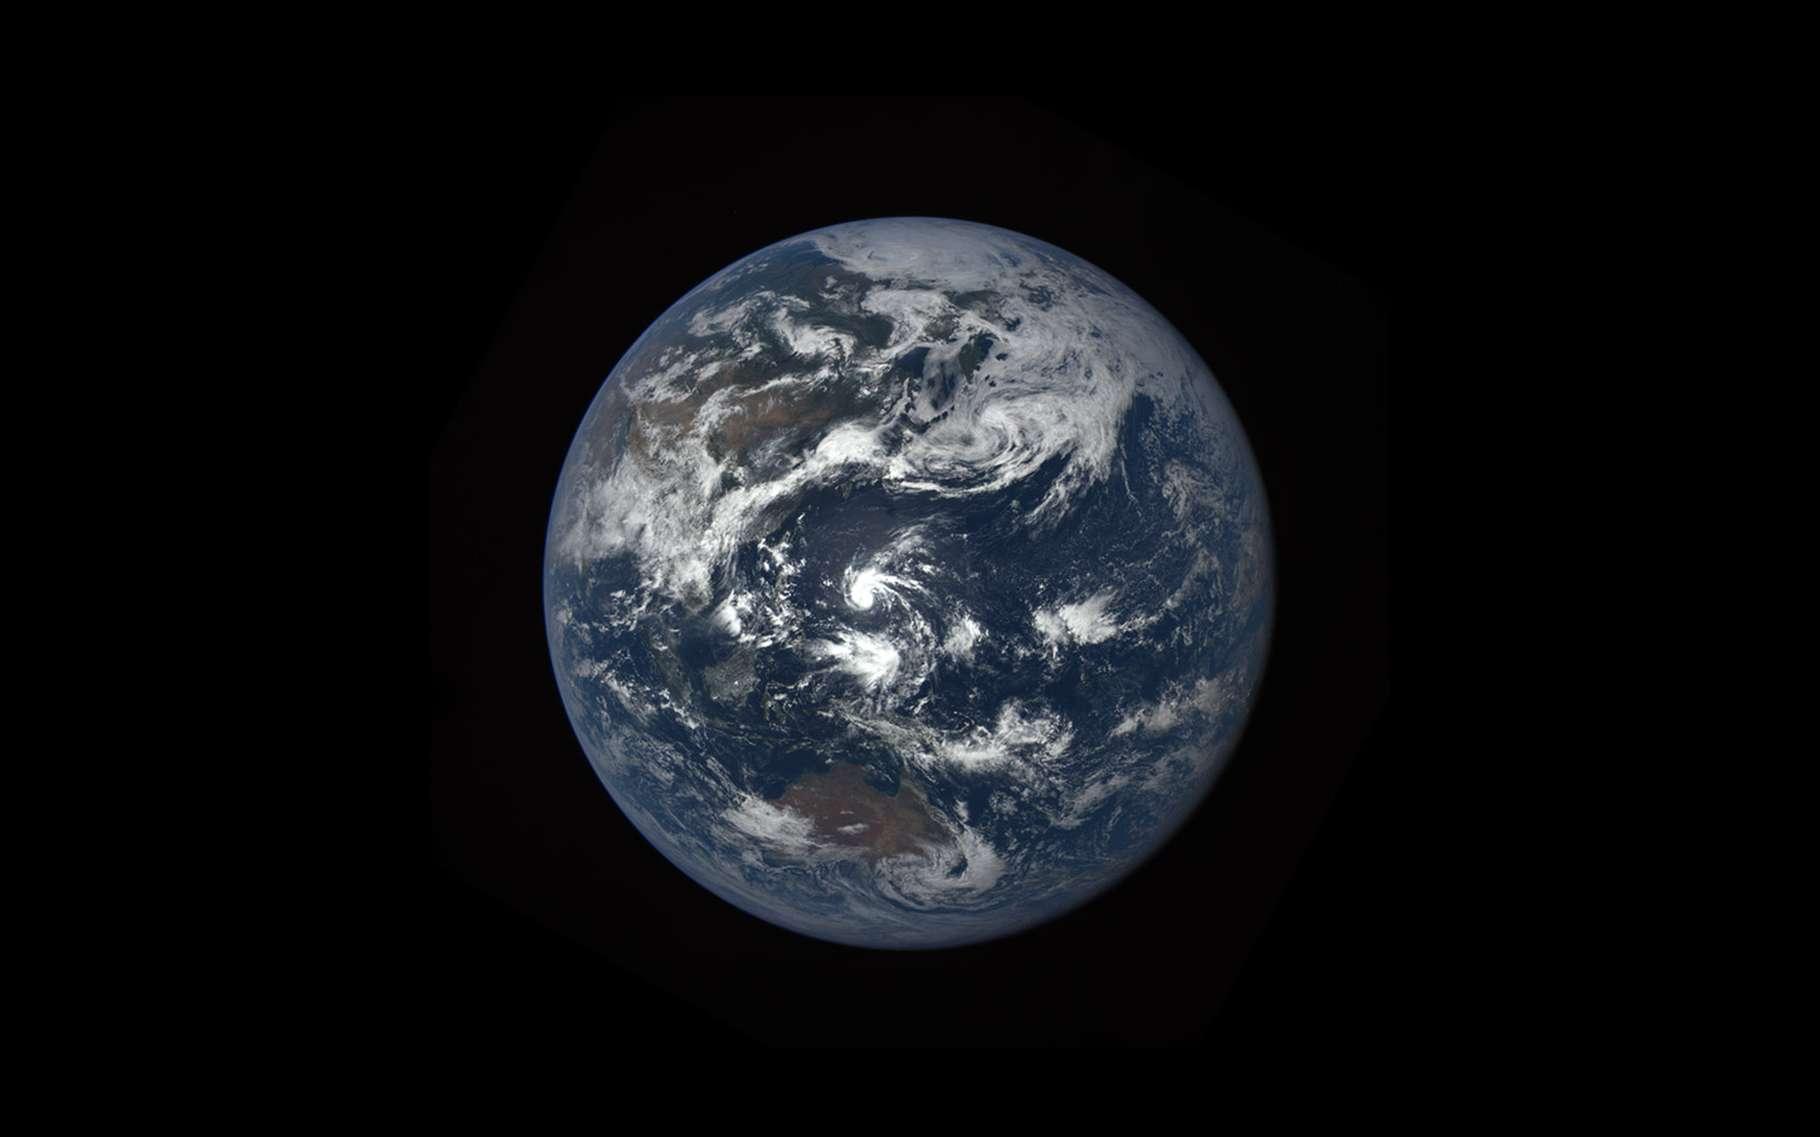 La Terre vue depuis le satellite DSCOVR de la Nasa. © Nasa, Epic Science team